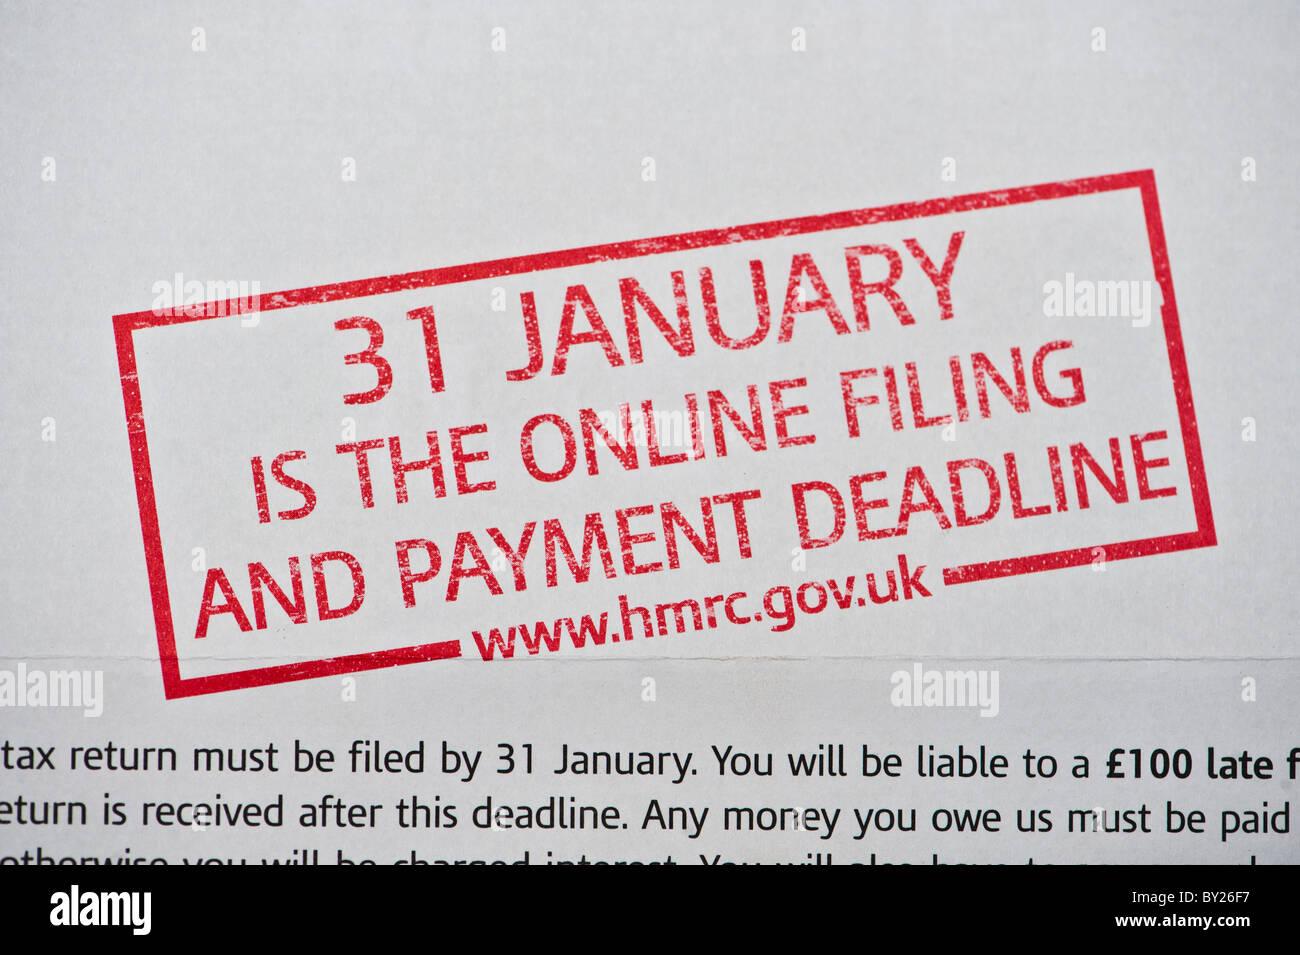 31 January UK tax deadline notice - Stock Image